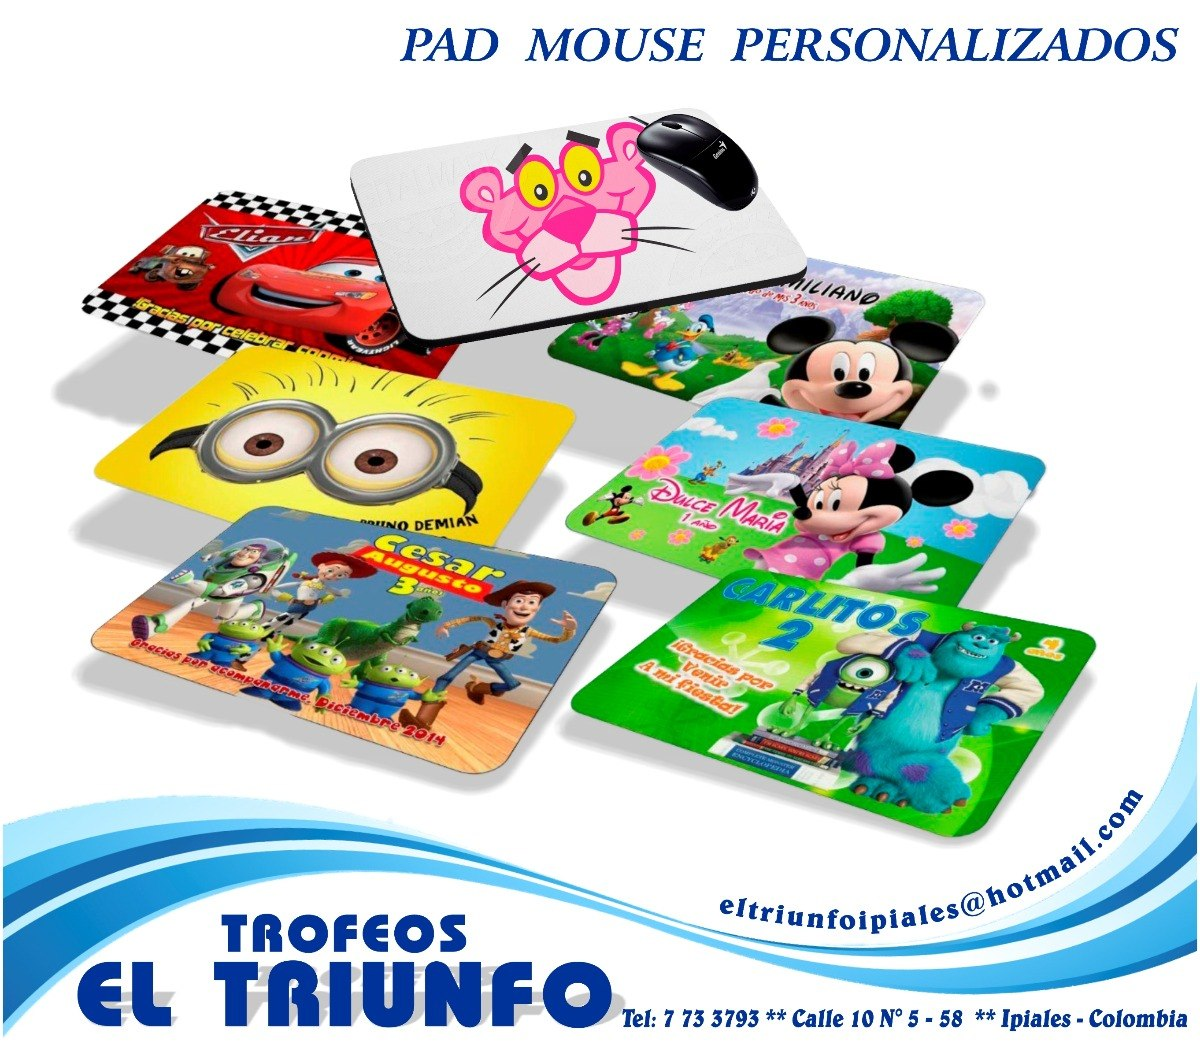 b4ab8fdbe Pad Mouse Personalizado Fullcolor 22 X 18 Cms -   10.000 en Mercado ...